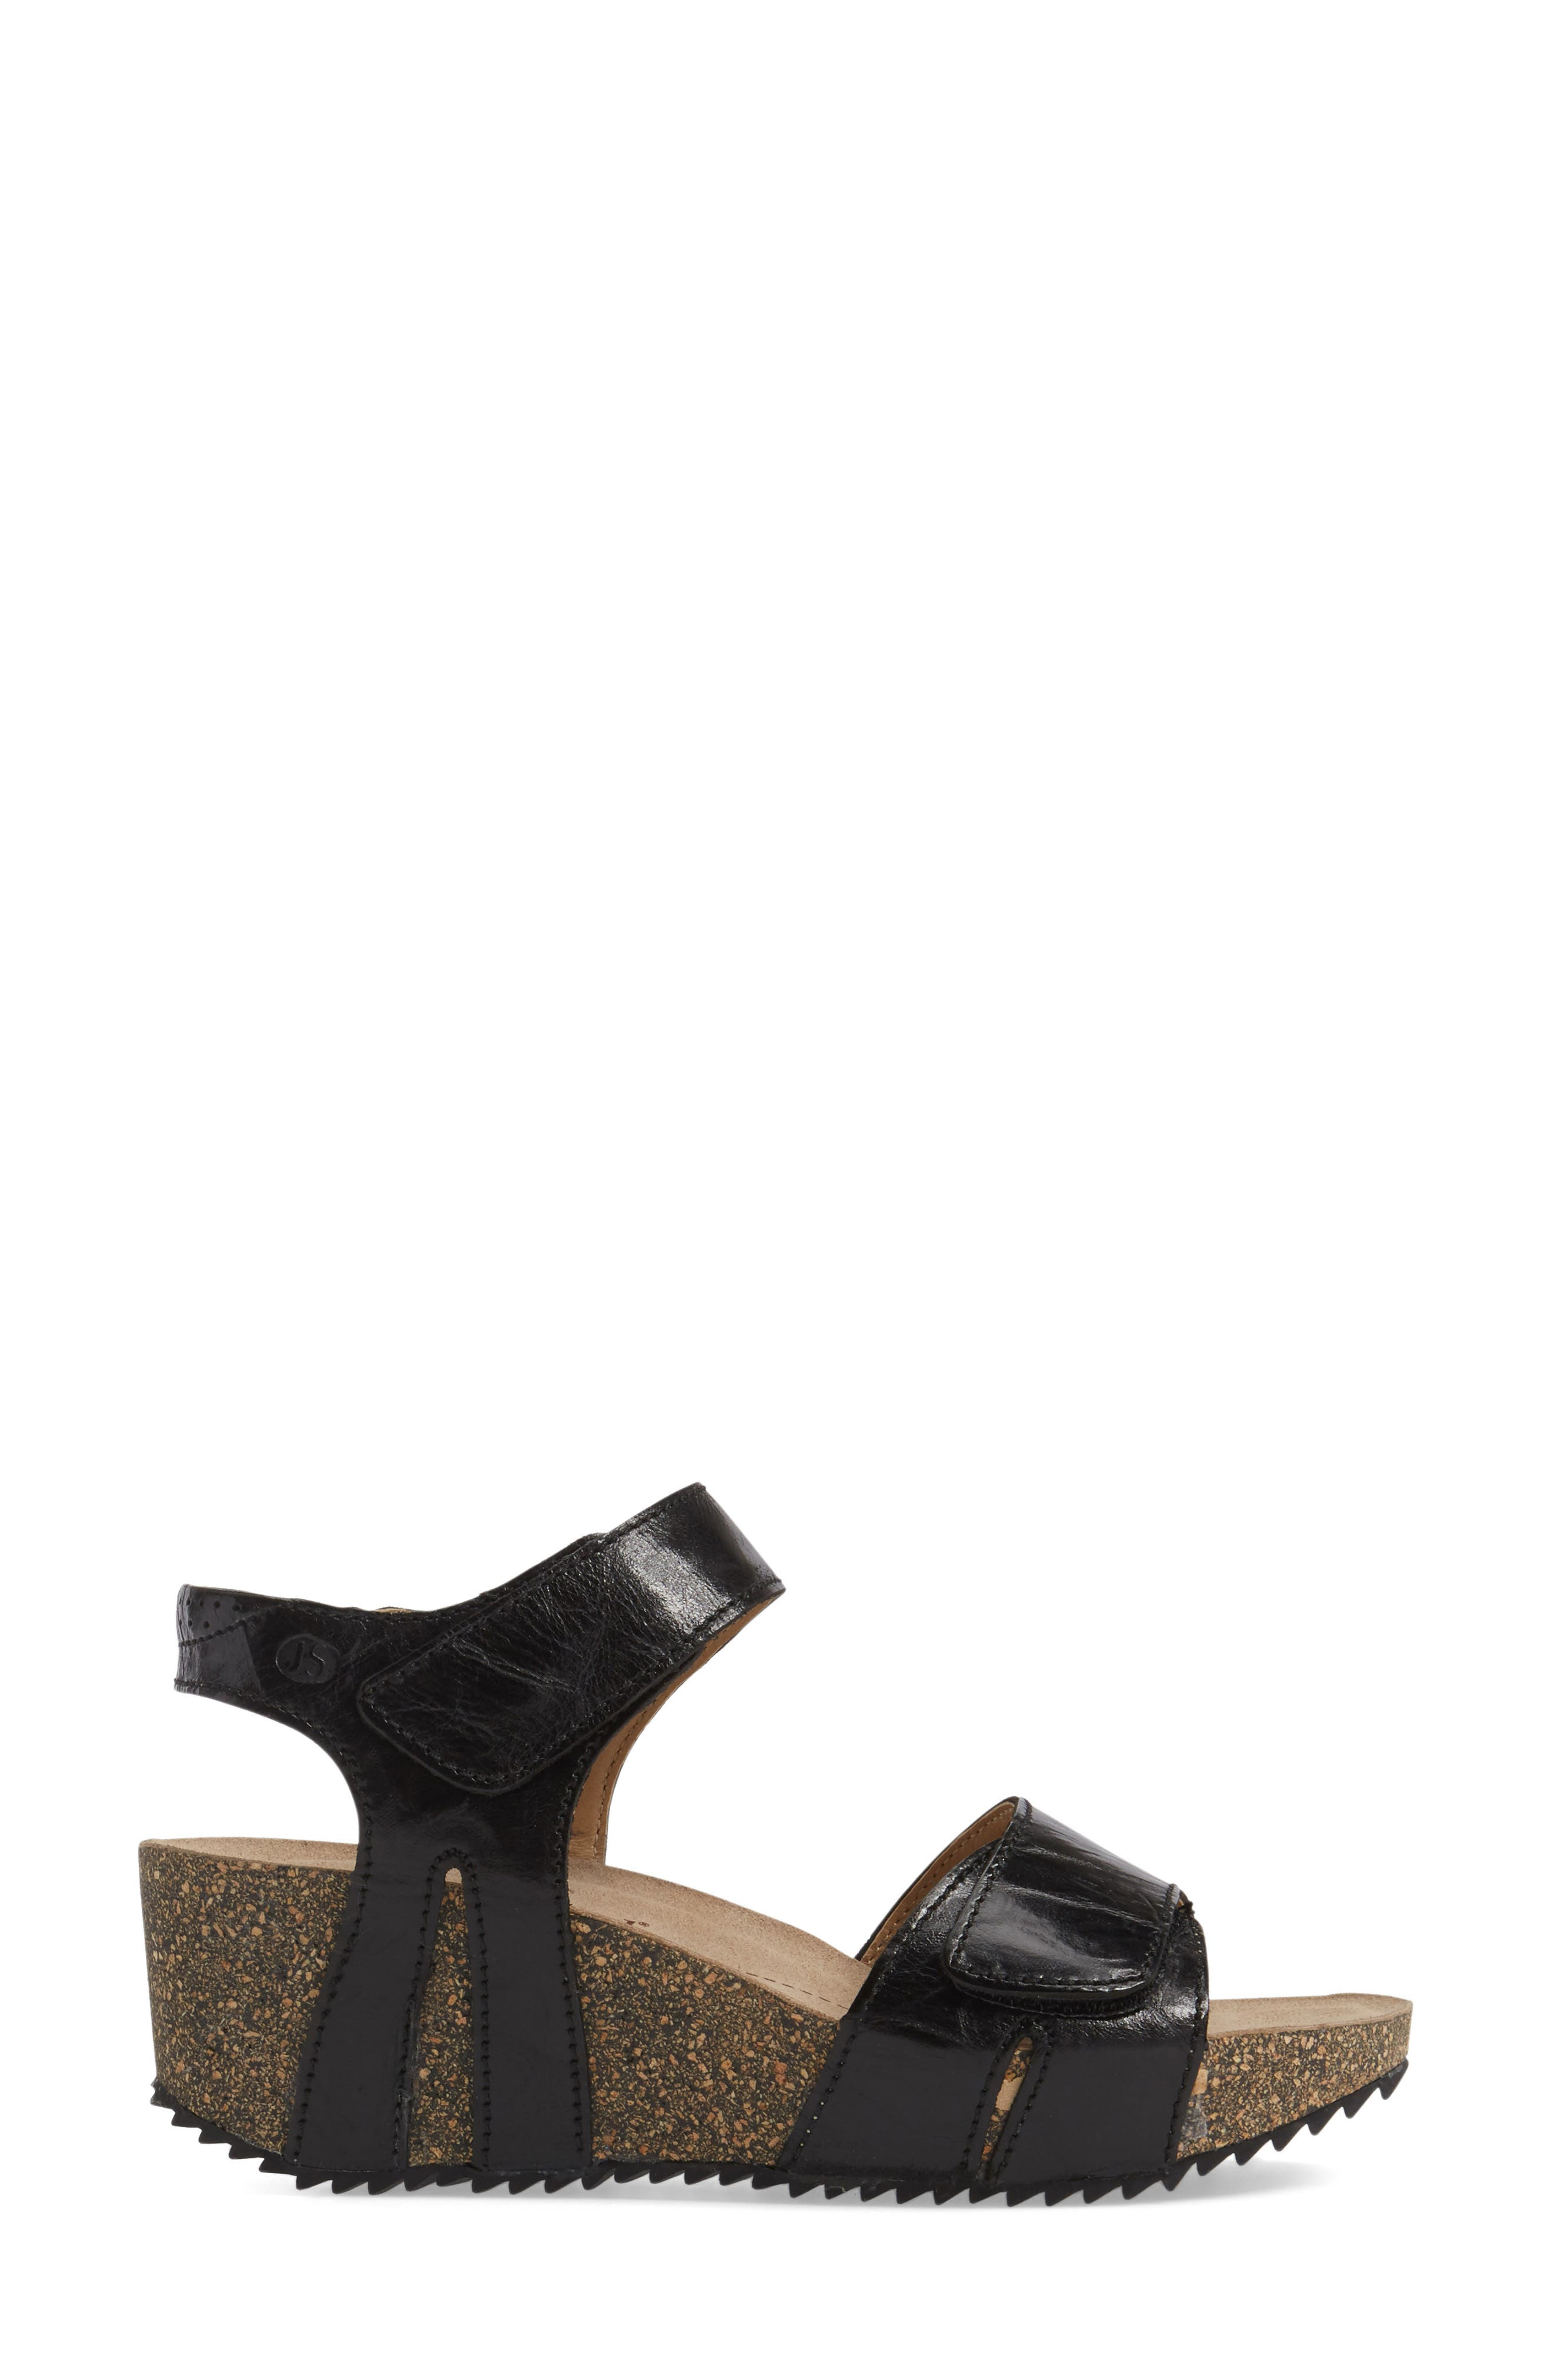 Alternate Image 3  - Josef Seibel Meike 11 Sandal (Women)